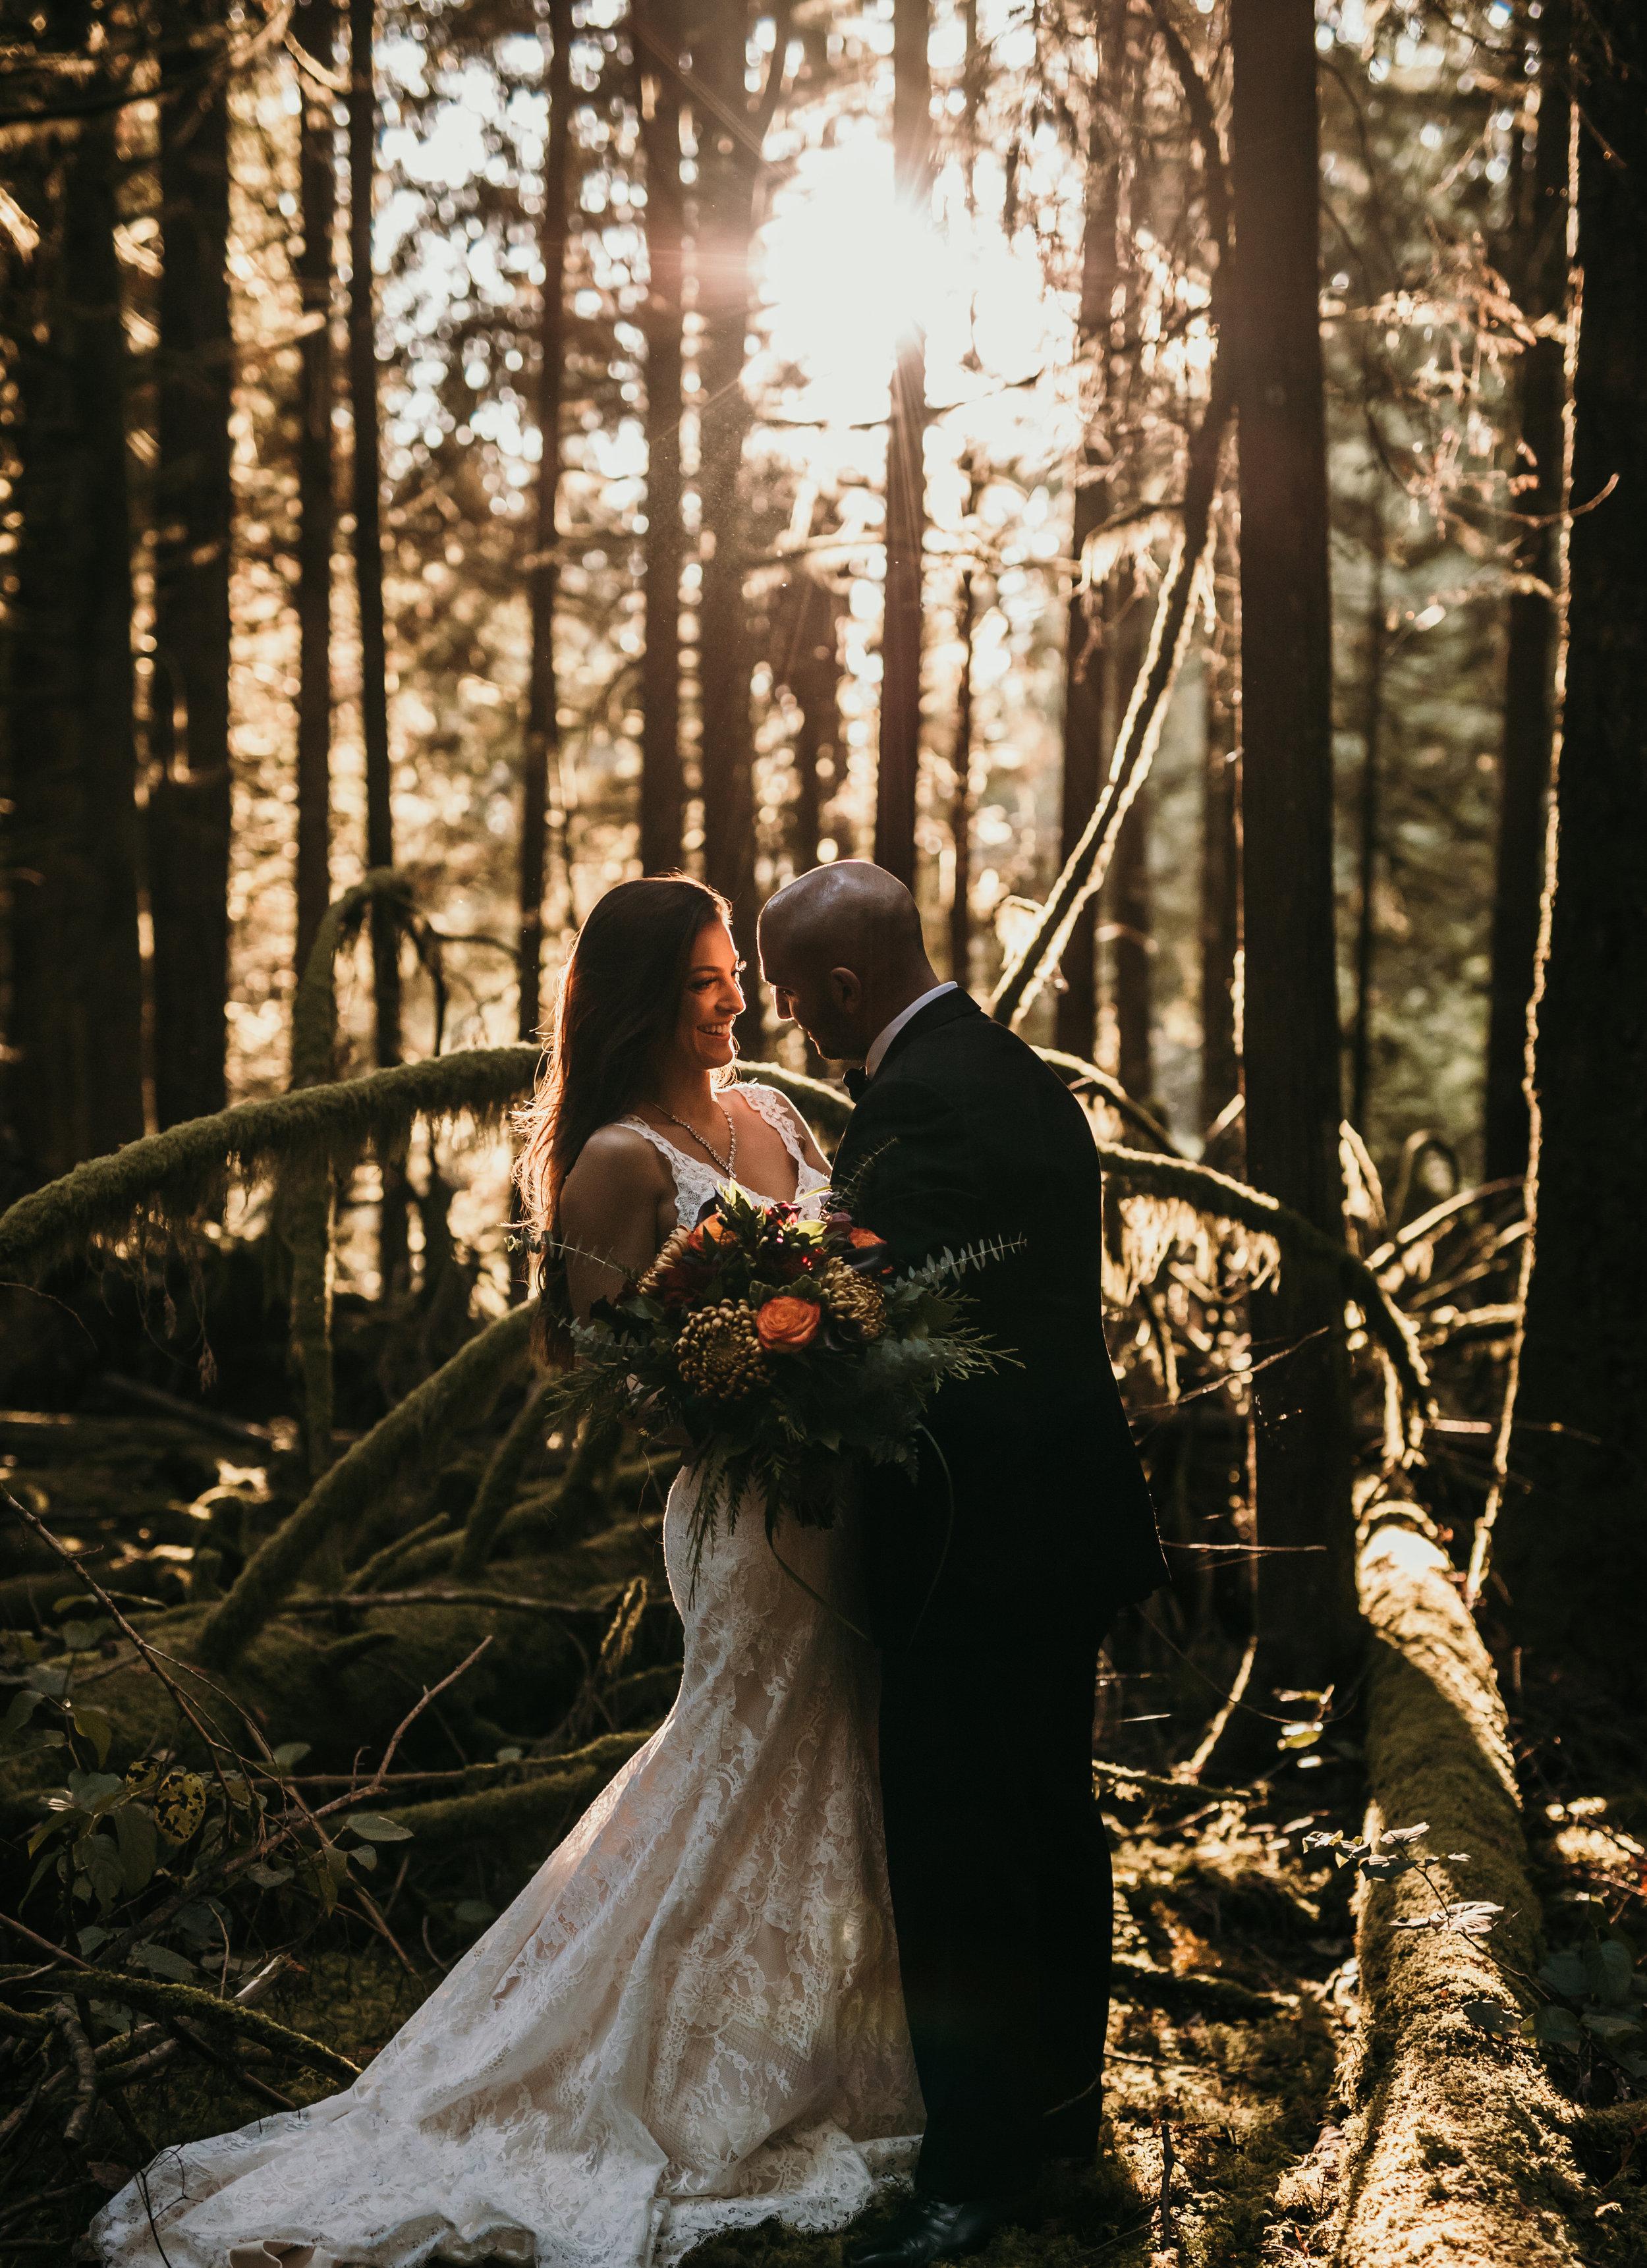 Day After Wedding Photos - Sunshine Coast Wedding Photos - Sunset Wedding Photos - Vancouver Wedding Photographer & Videographer - Sunshine Coast Wedding Photos - Sunshine Coast Wedding Photographer - Jennifer Picard Photography - 1A5A8013.jpg